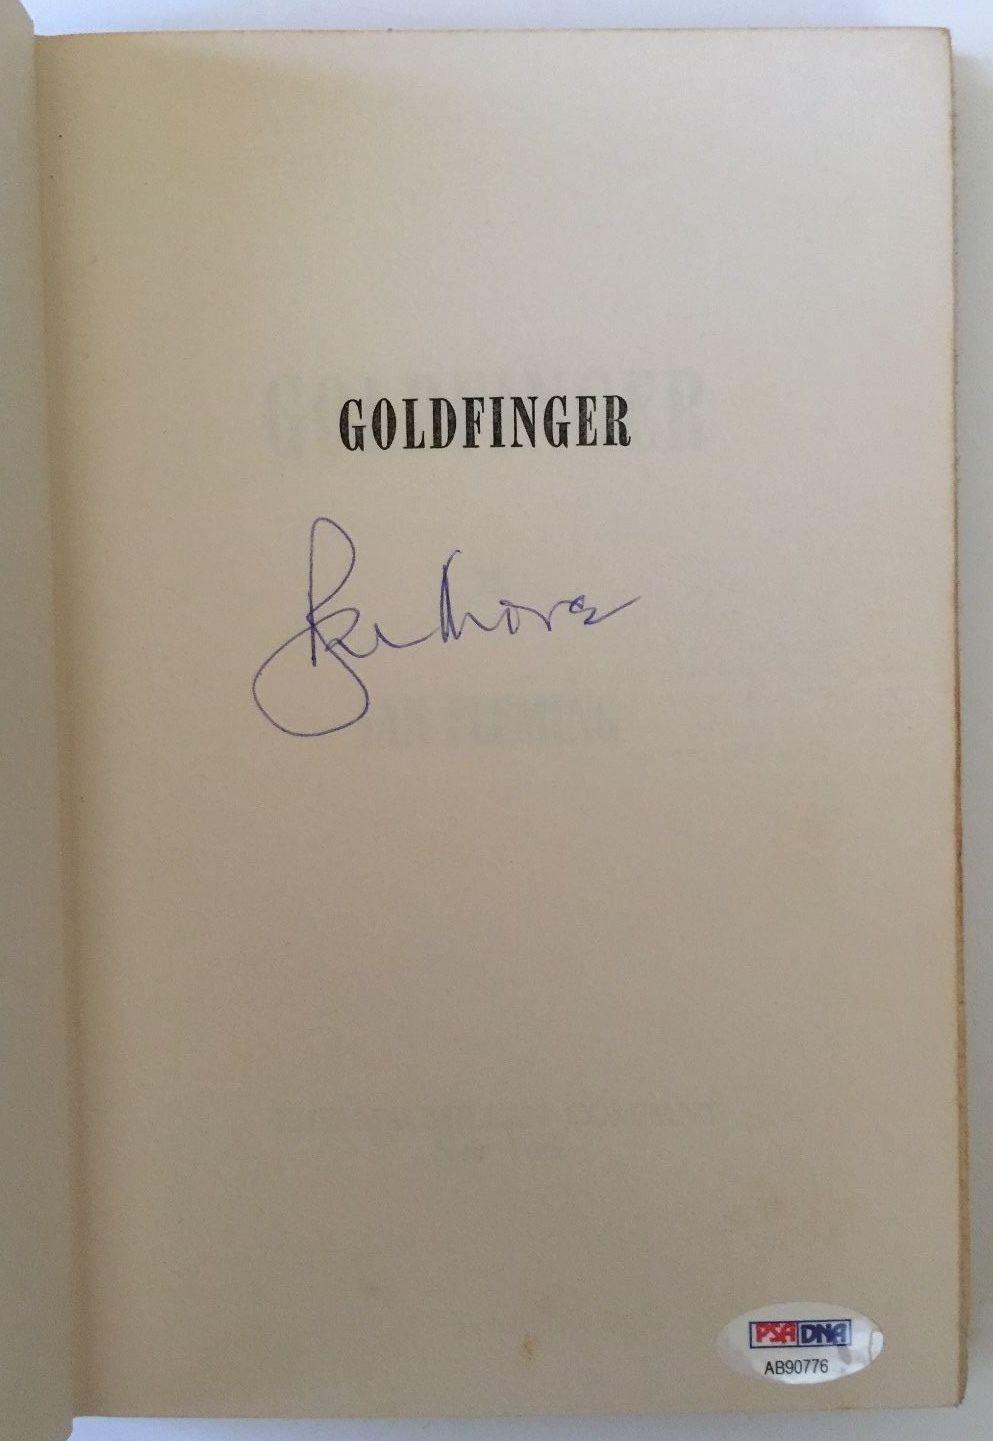 ROGER MOORE Signed JAMES BOND GOLDFINGER Fleming Book PSA/DNA COA Photo Proof